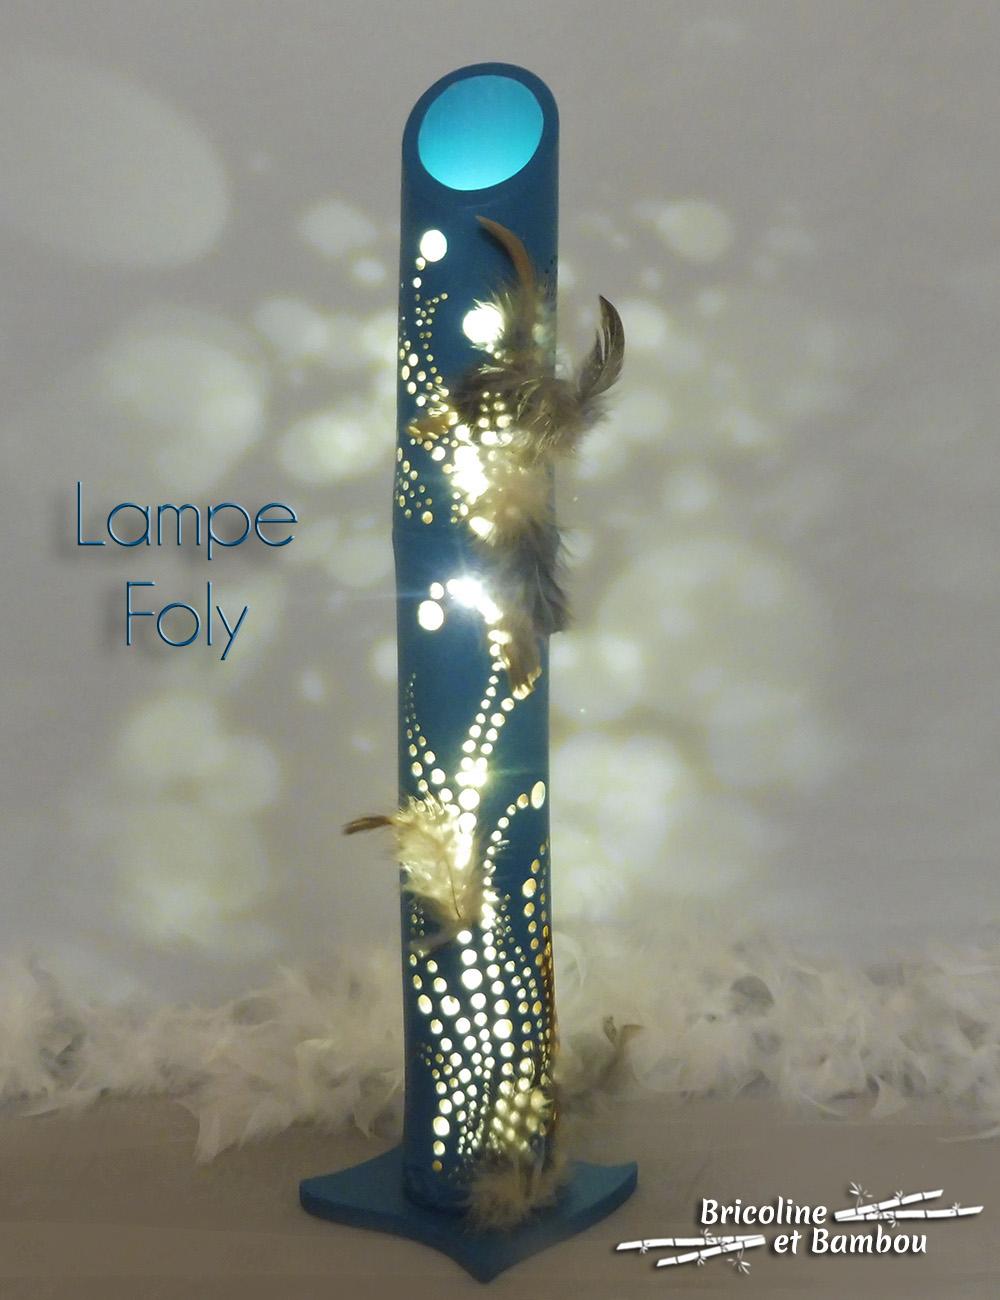 Lampe Foly